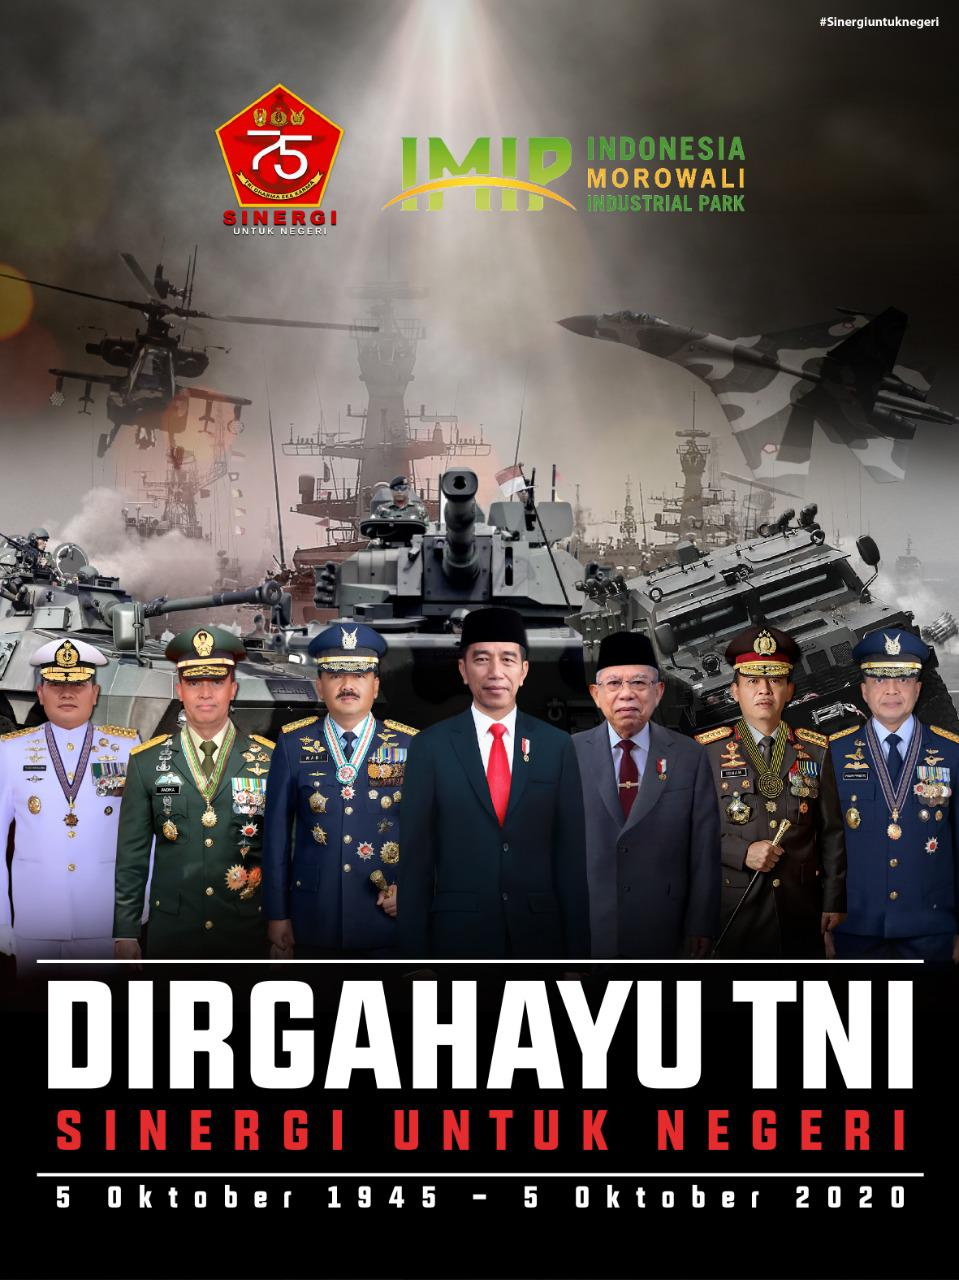 IMIP Dirgahayu TNI